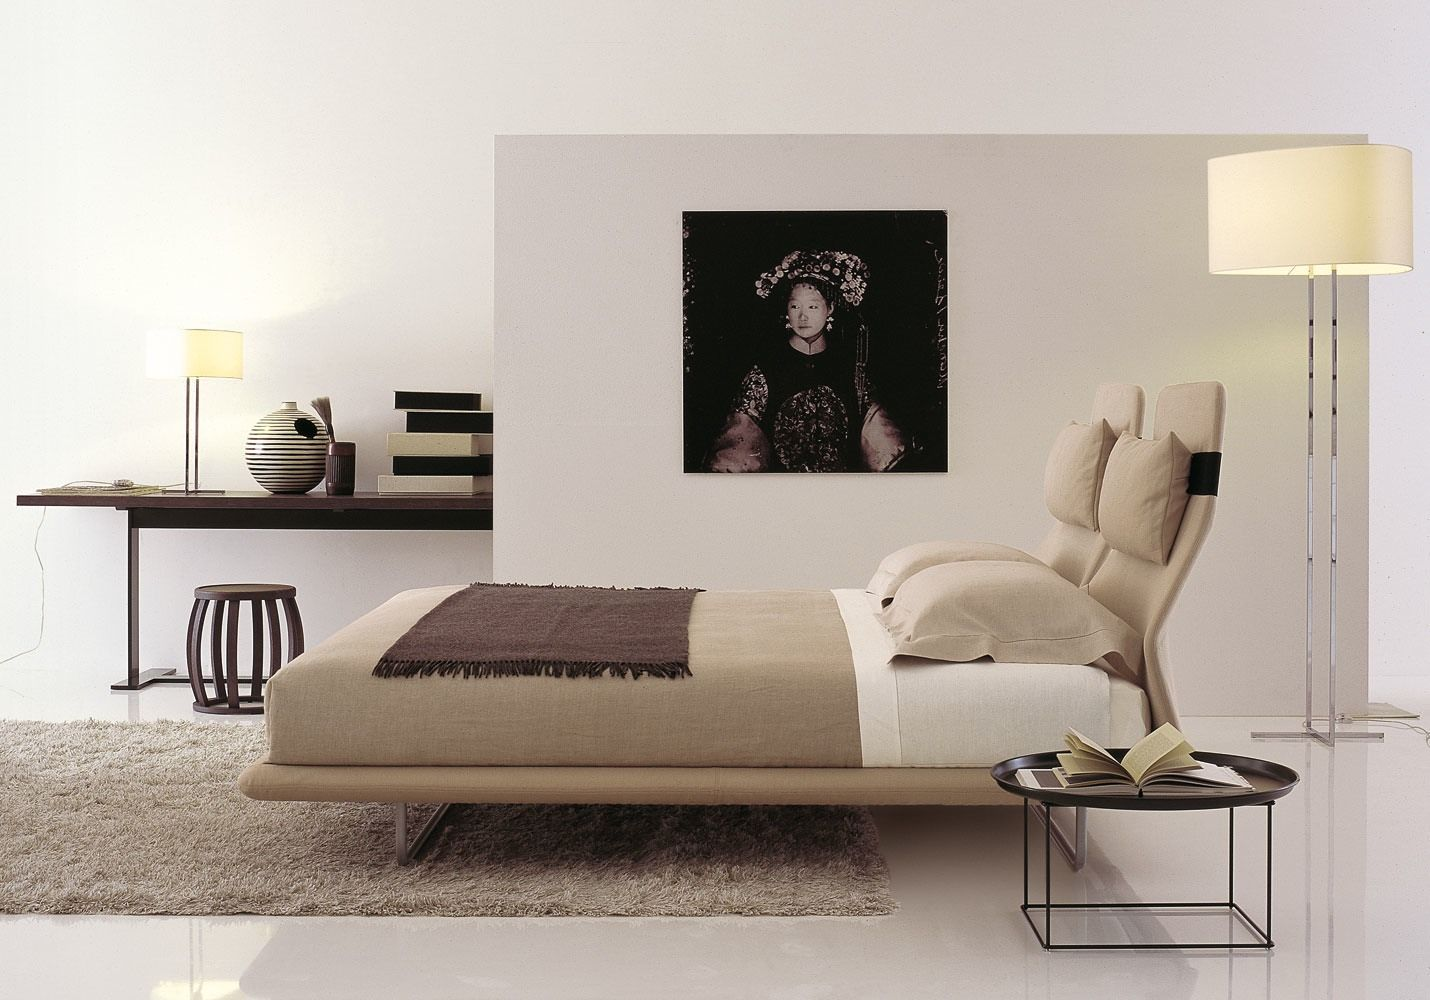 Modern teen bedroom decorating ideas cama lazy night  bub italia  manuel lucas muebles elche